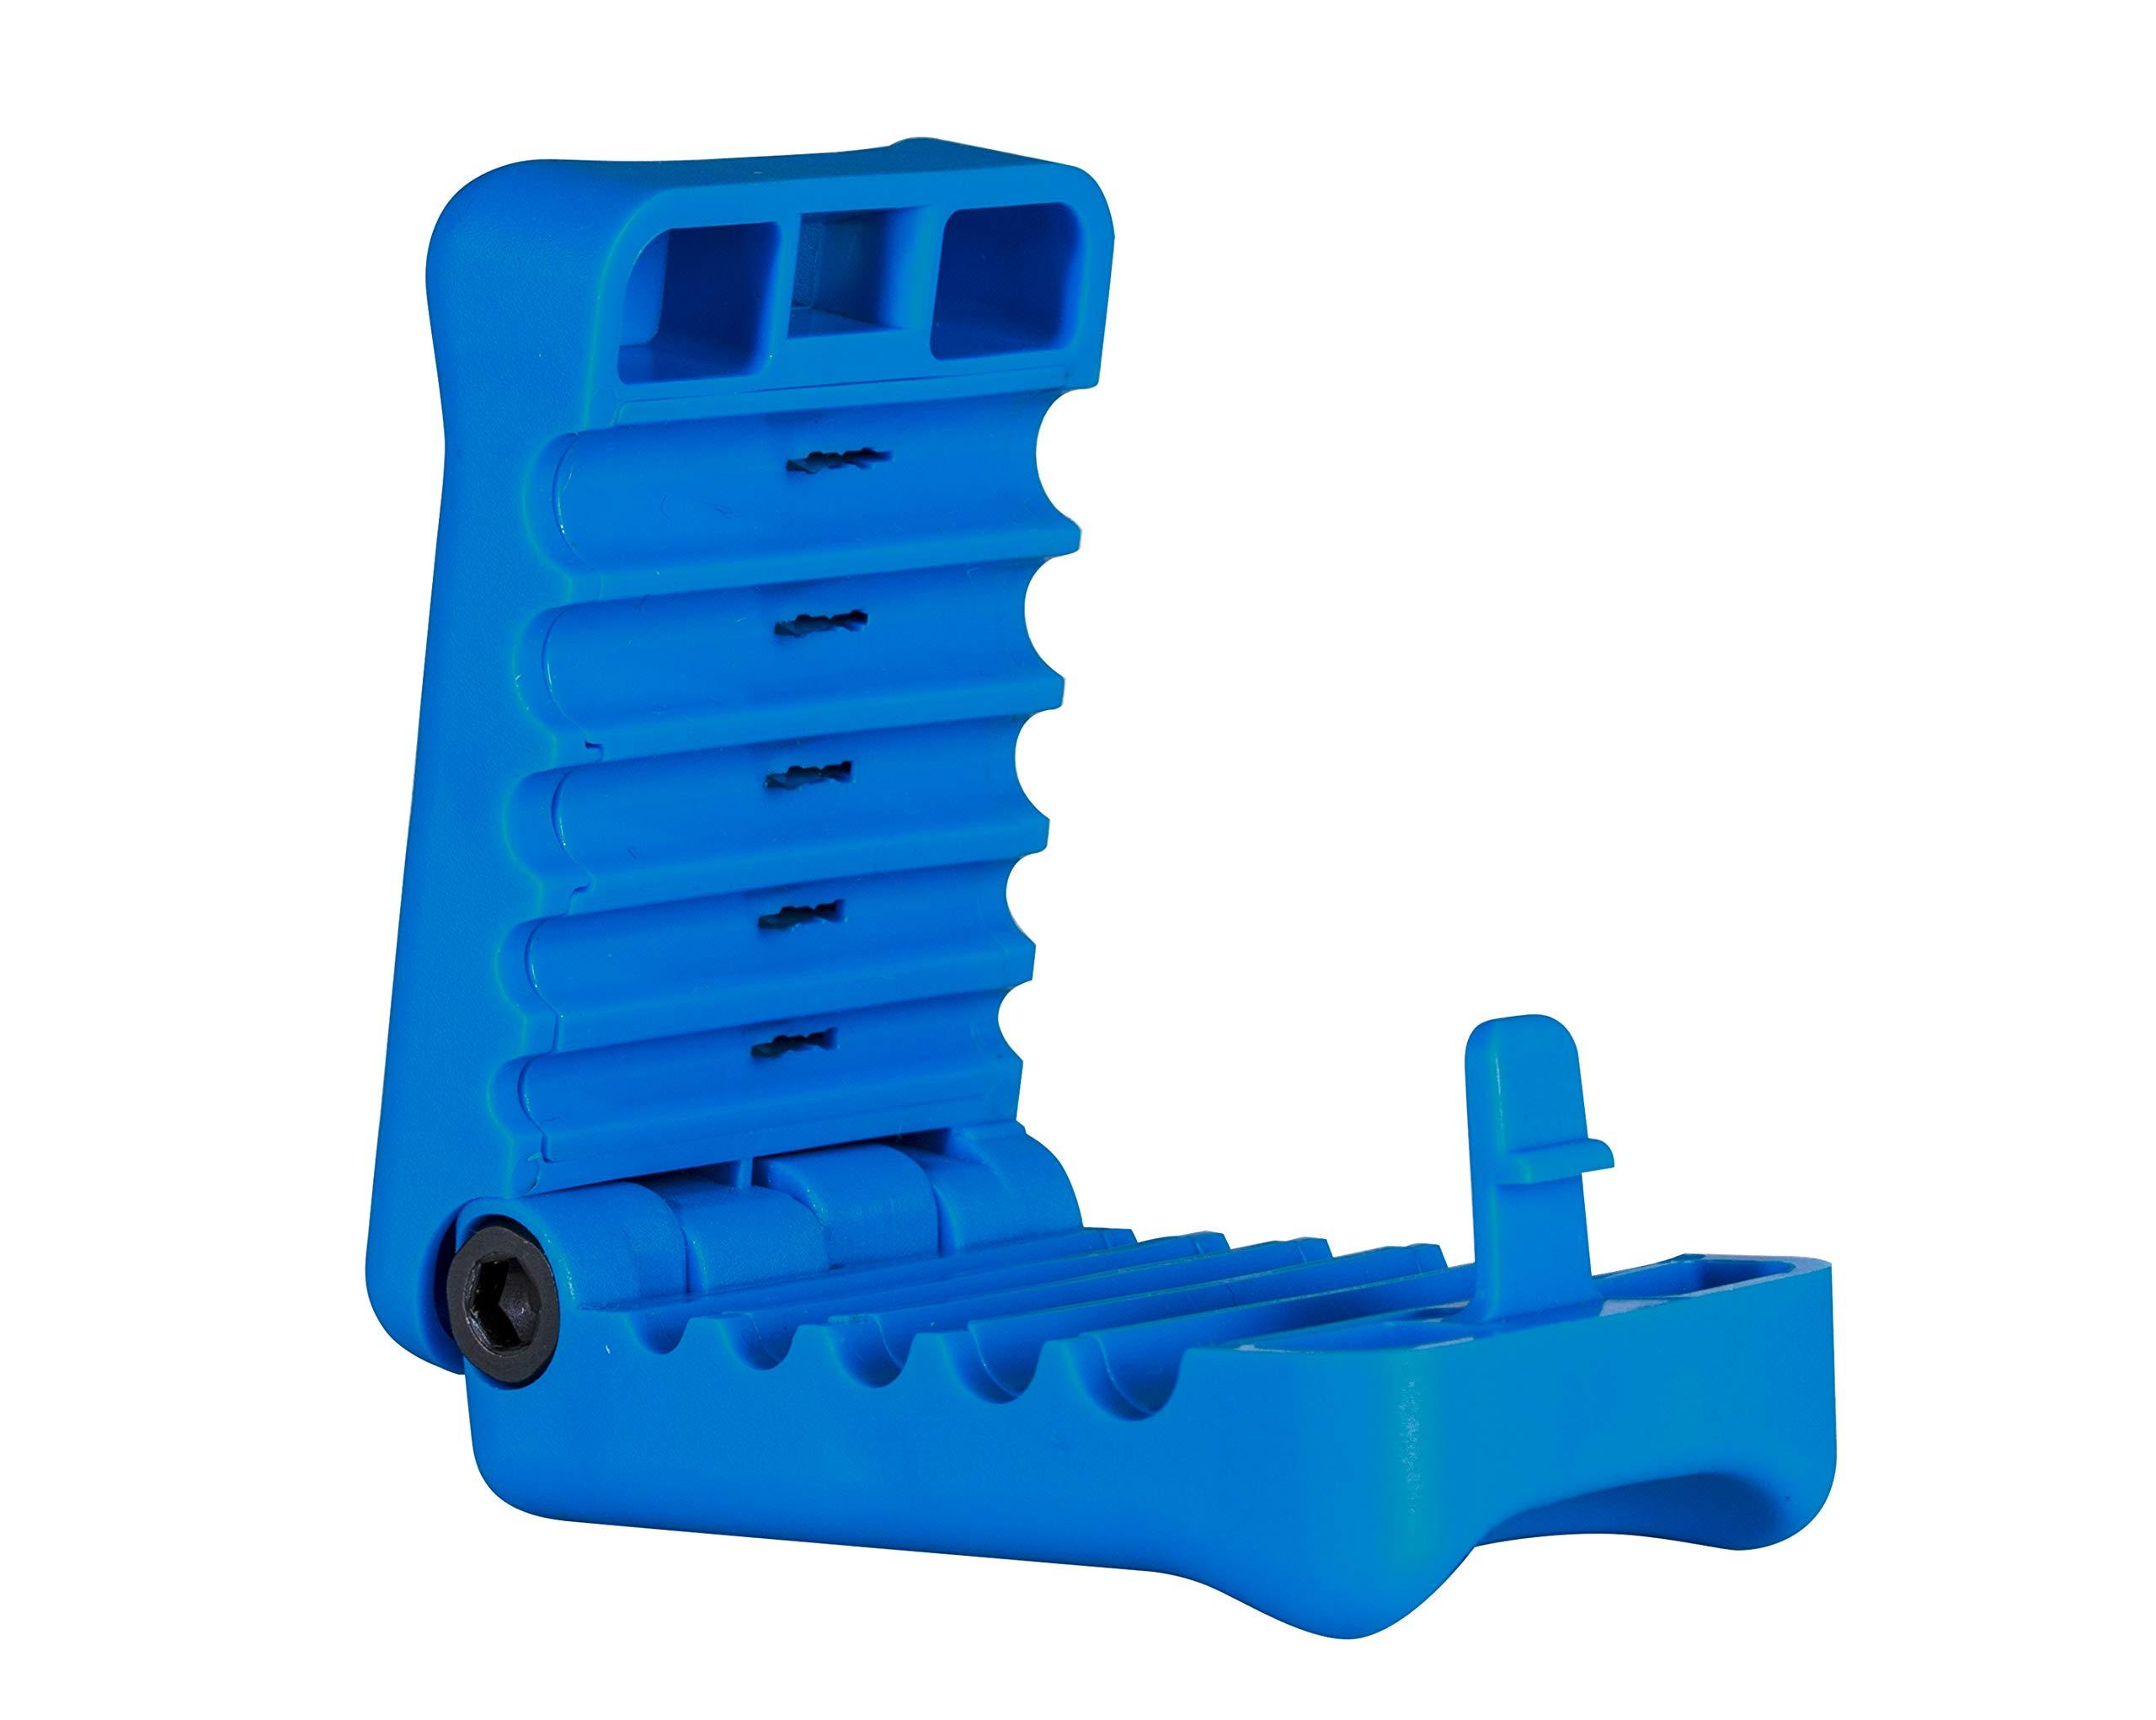 Jonard Tools MS-26 Mid Span Fiber Optic Cable Slitter (2.9 mm - 6.8 mm)